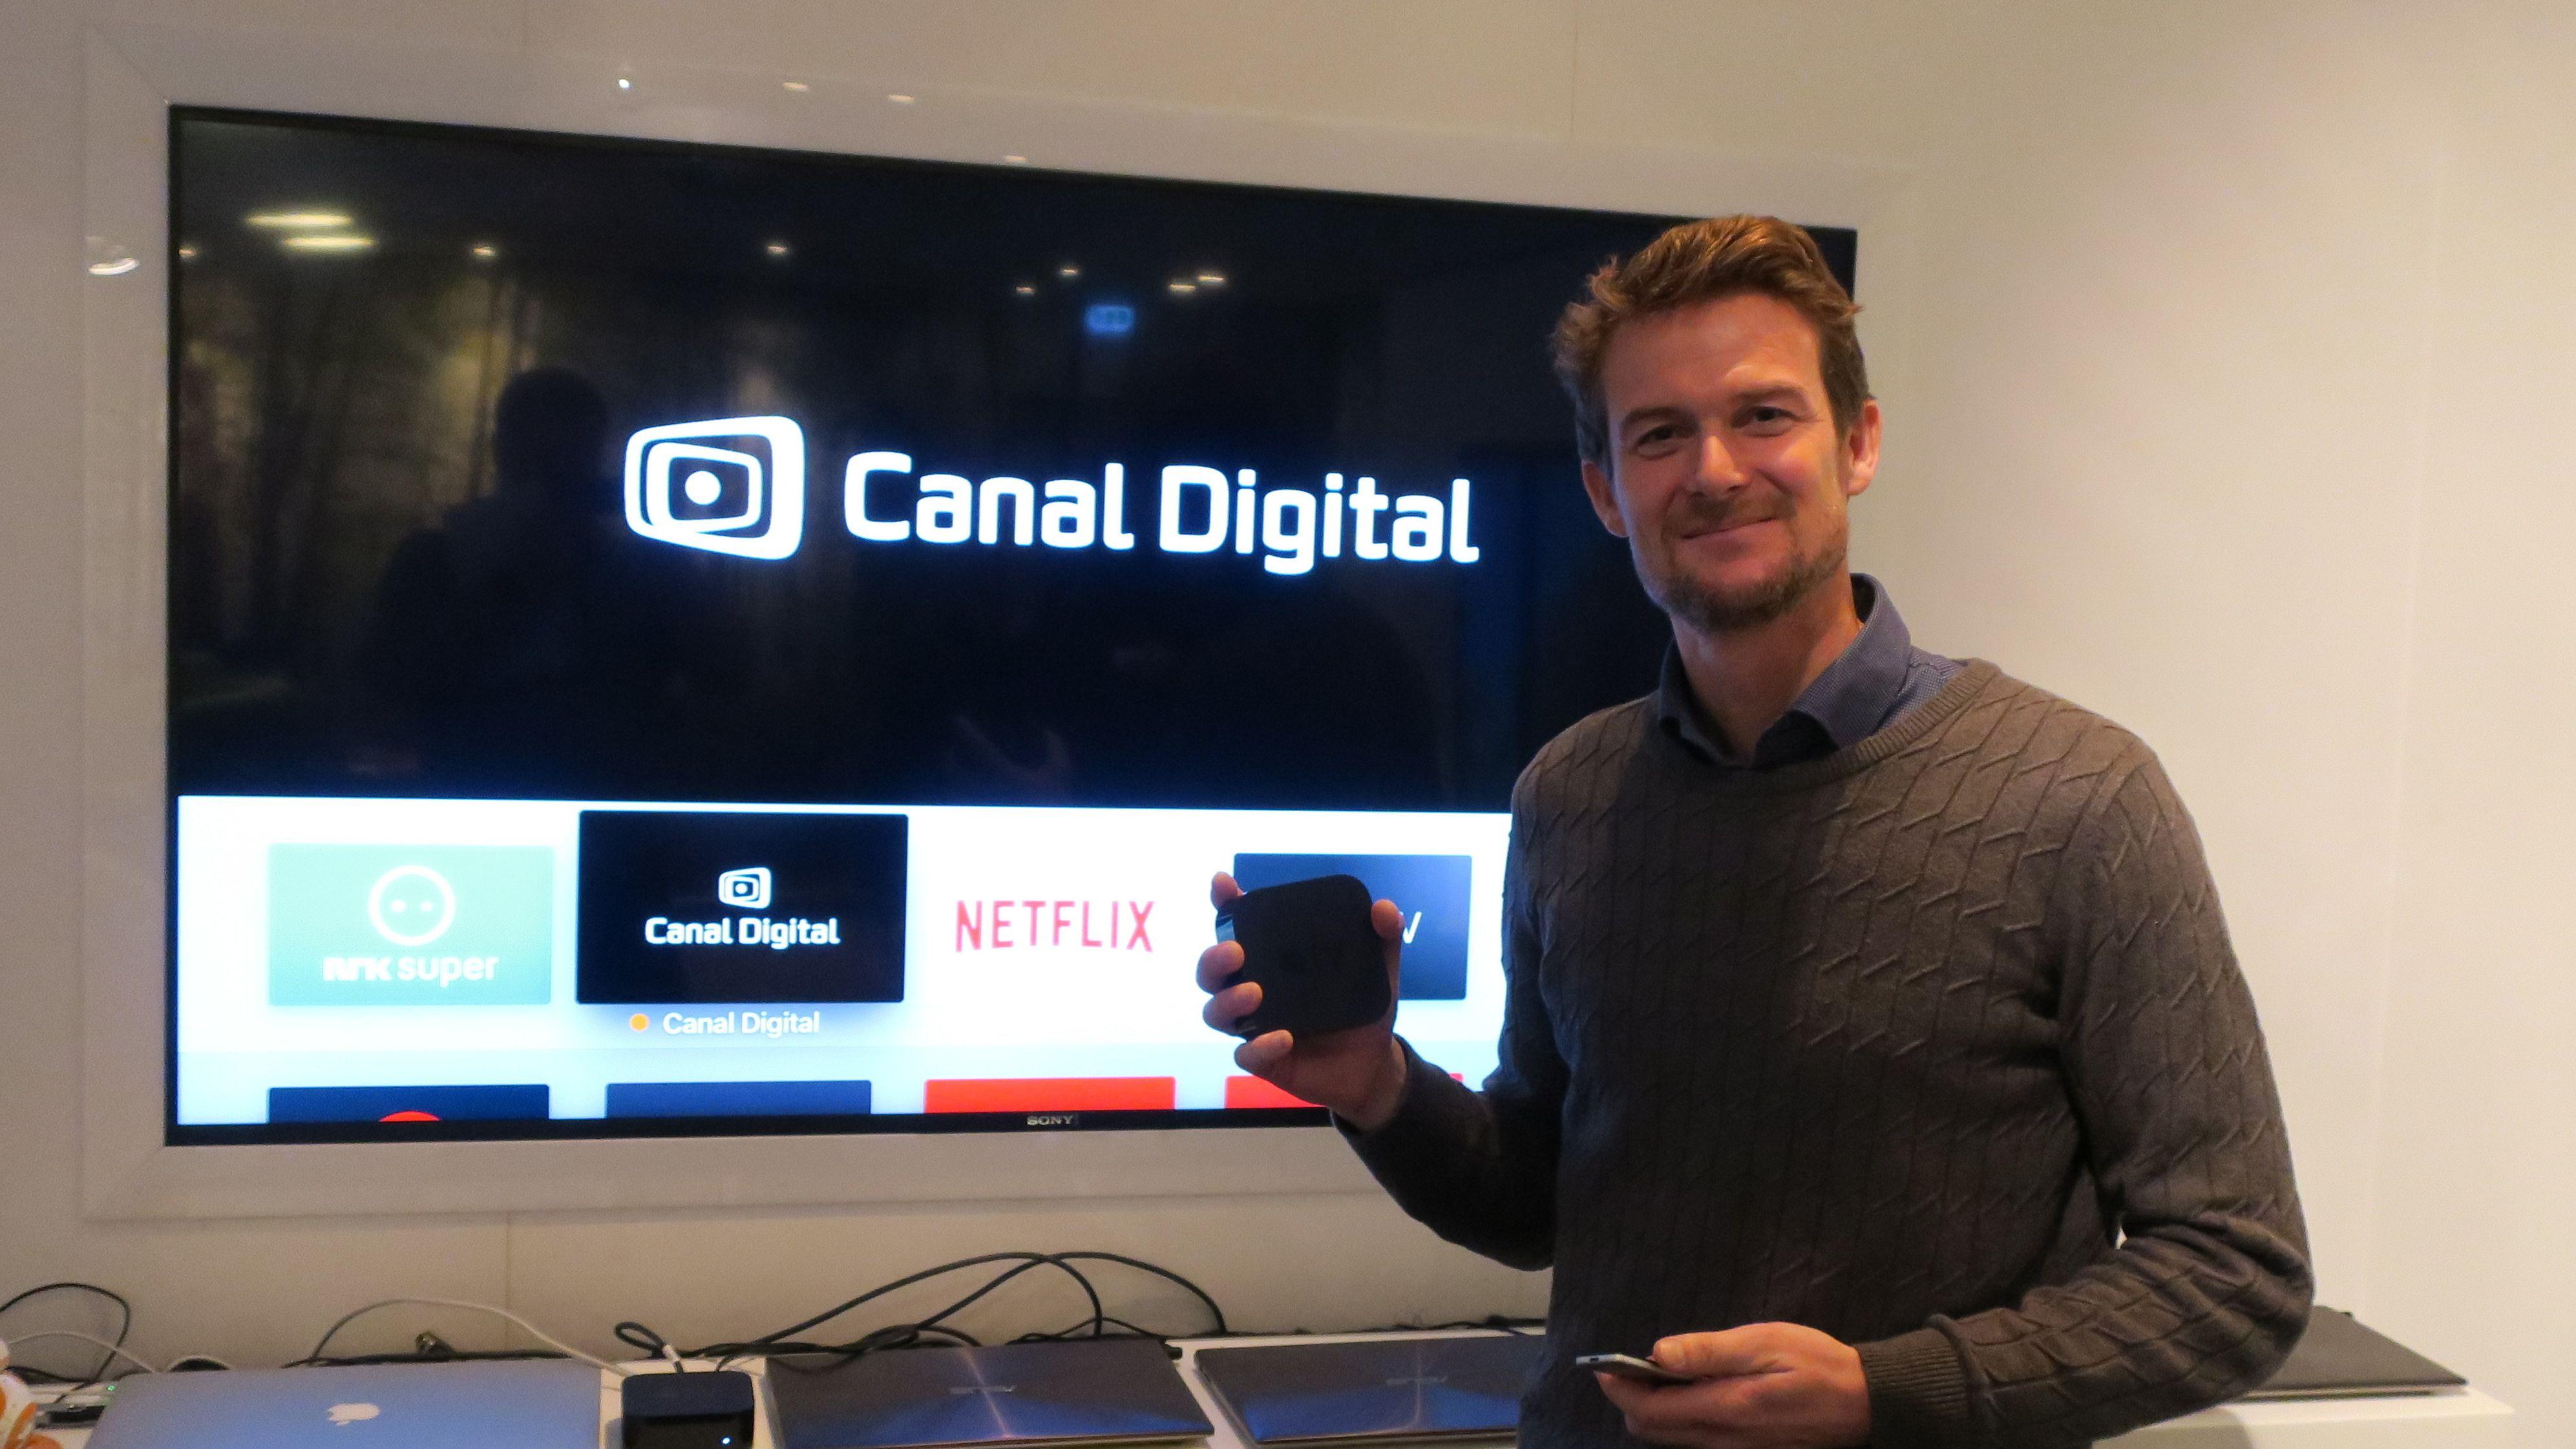 Nå kan du se Canal Digitals innhold med Apple TV